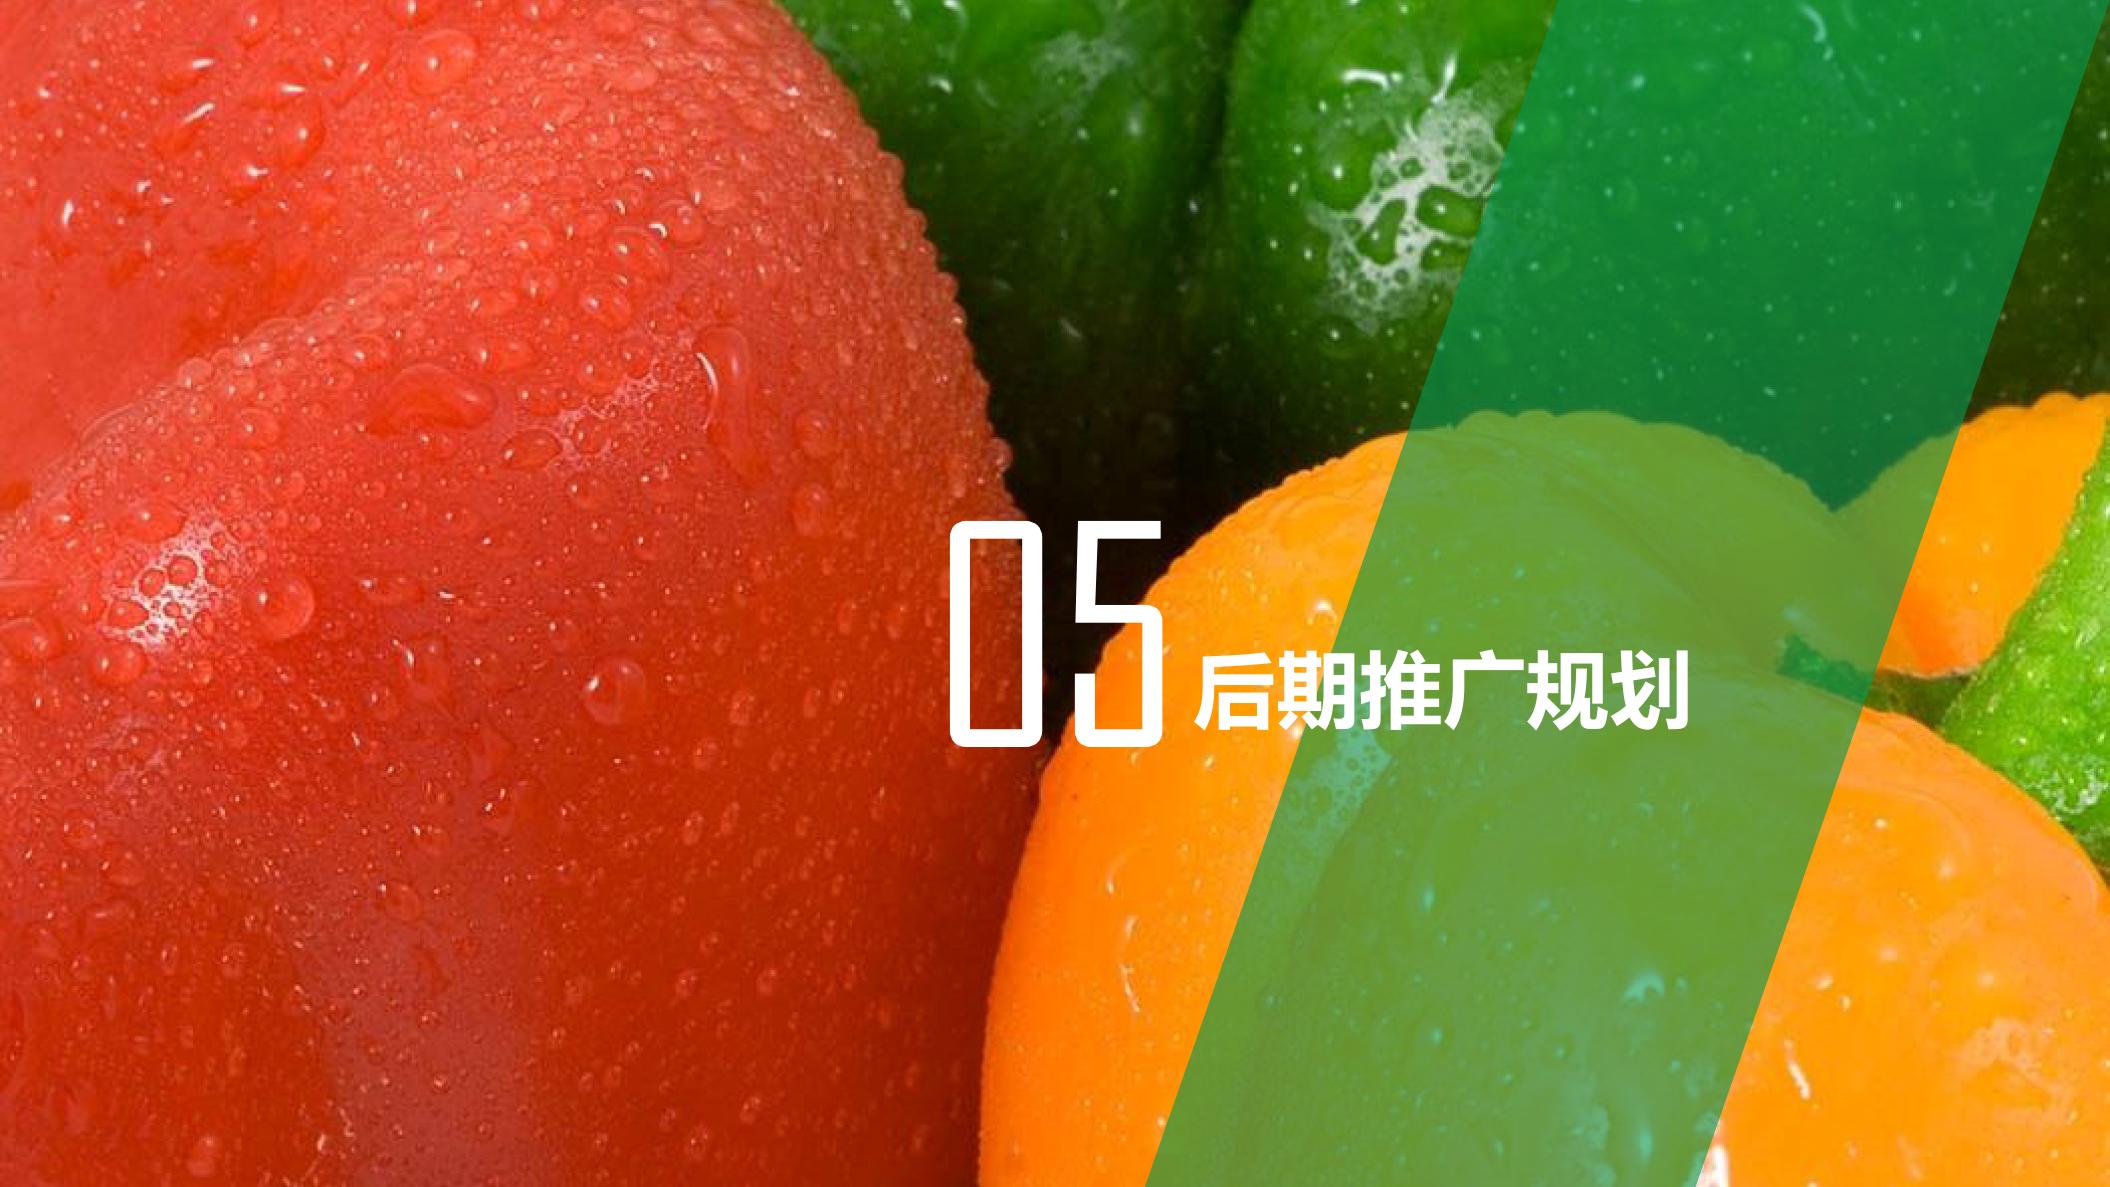 F1+vbj村小爱+软件游戏+张洁0608_17.png